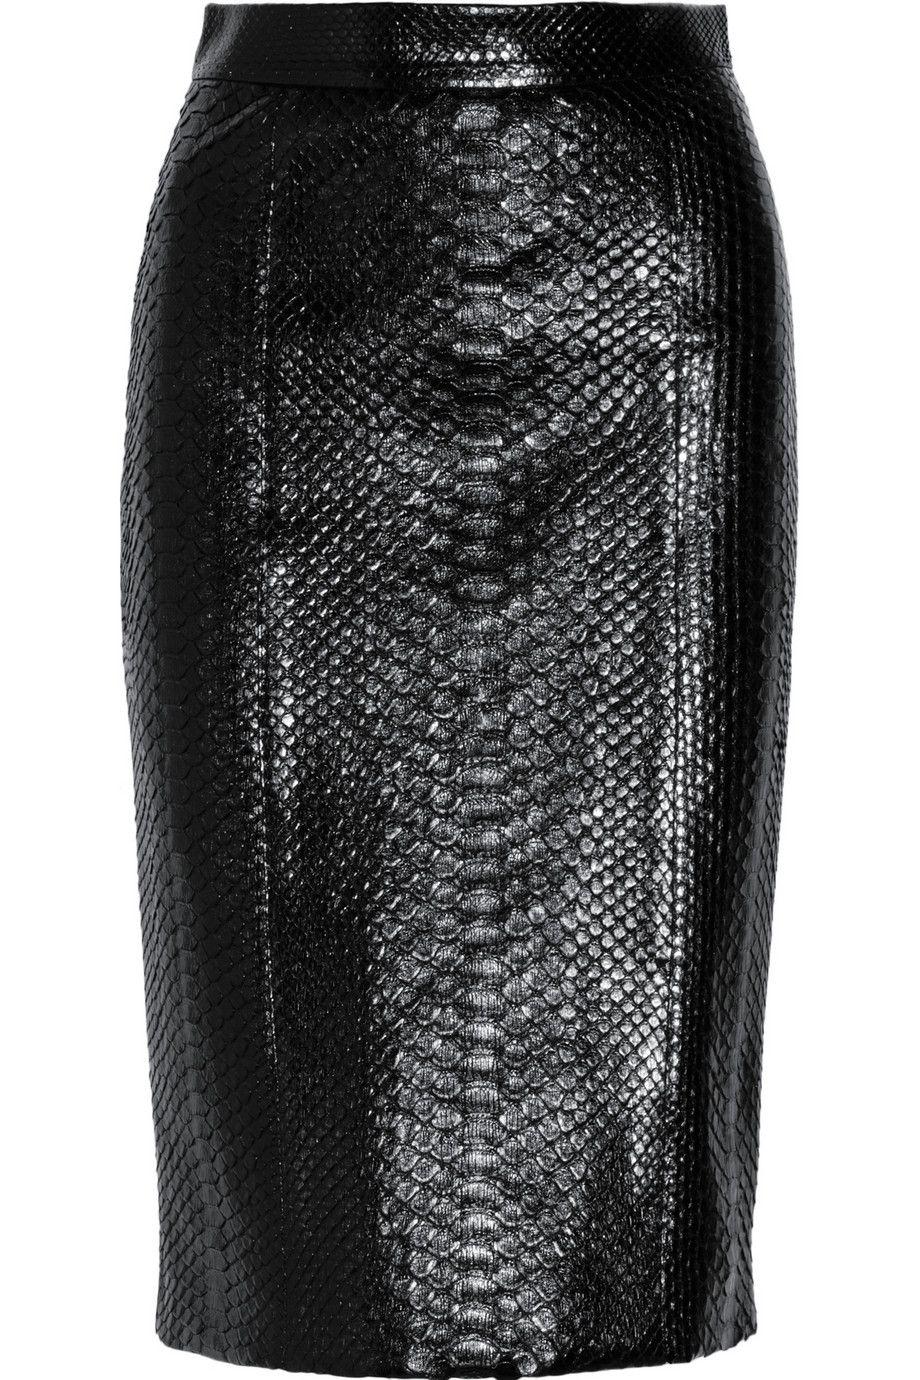 Gucci|Python pencil skirt